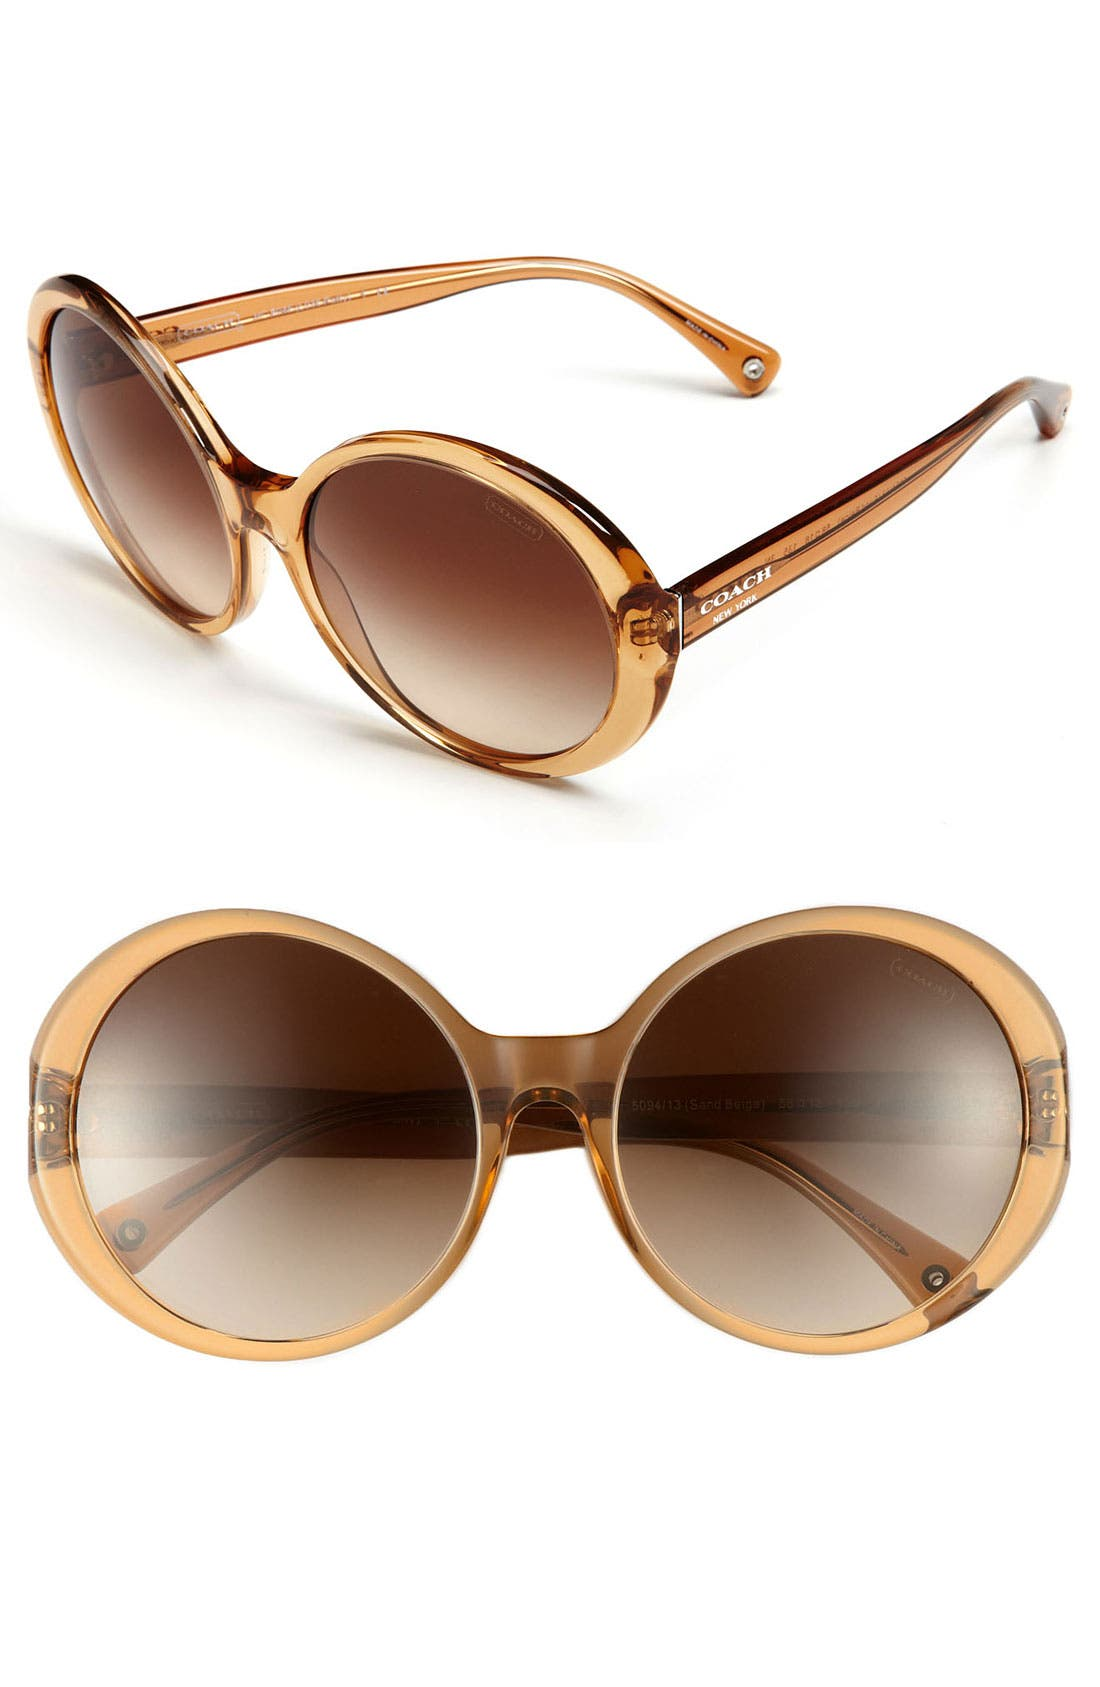 Alternate Image 1 Selected - COACH 58mm Retro Oversized Sunglasses